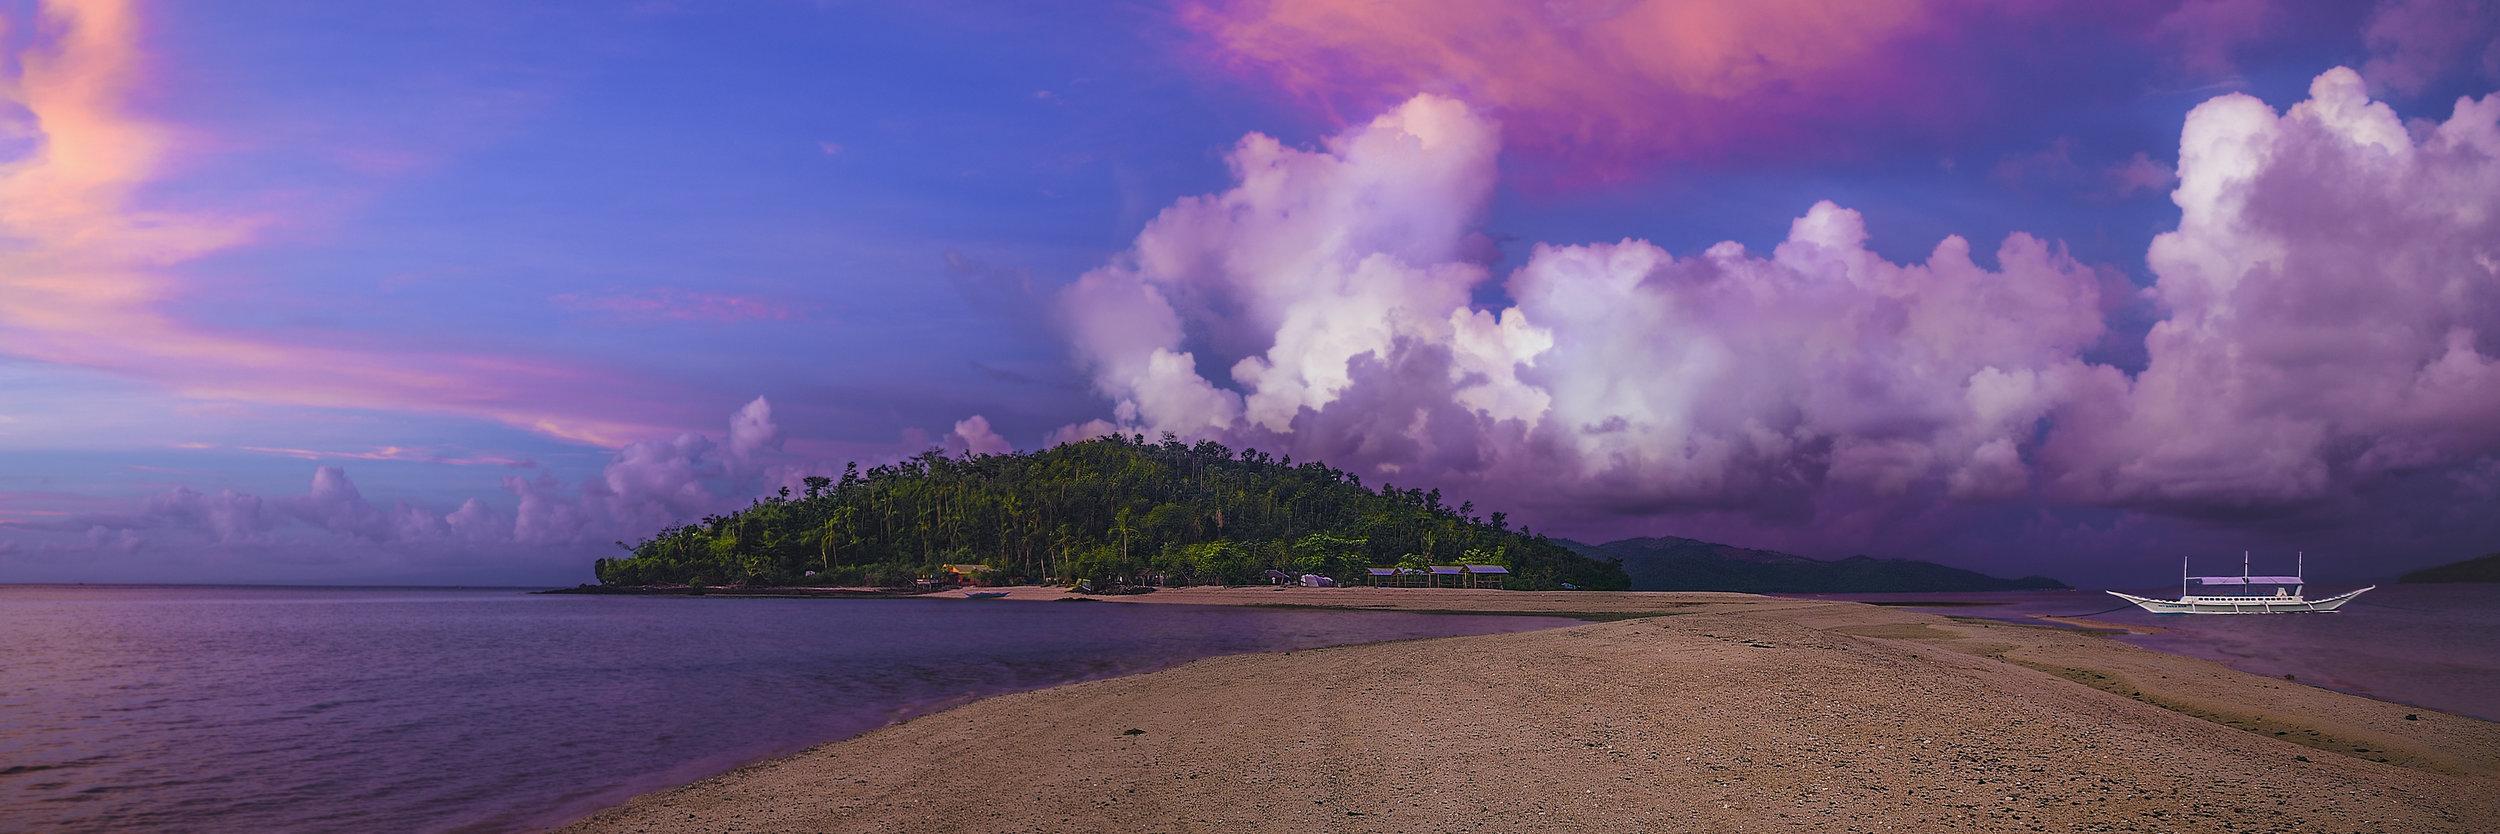 Sand Bar Isle.jpg